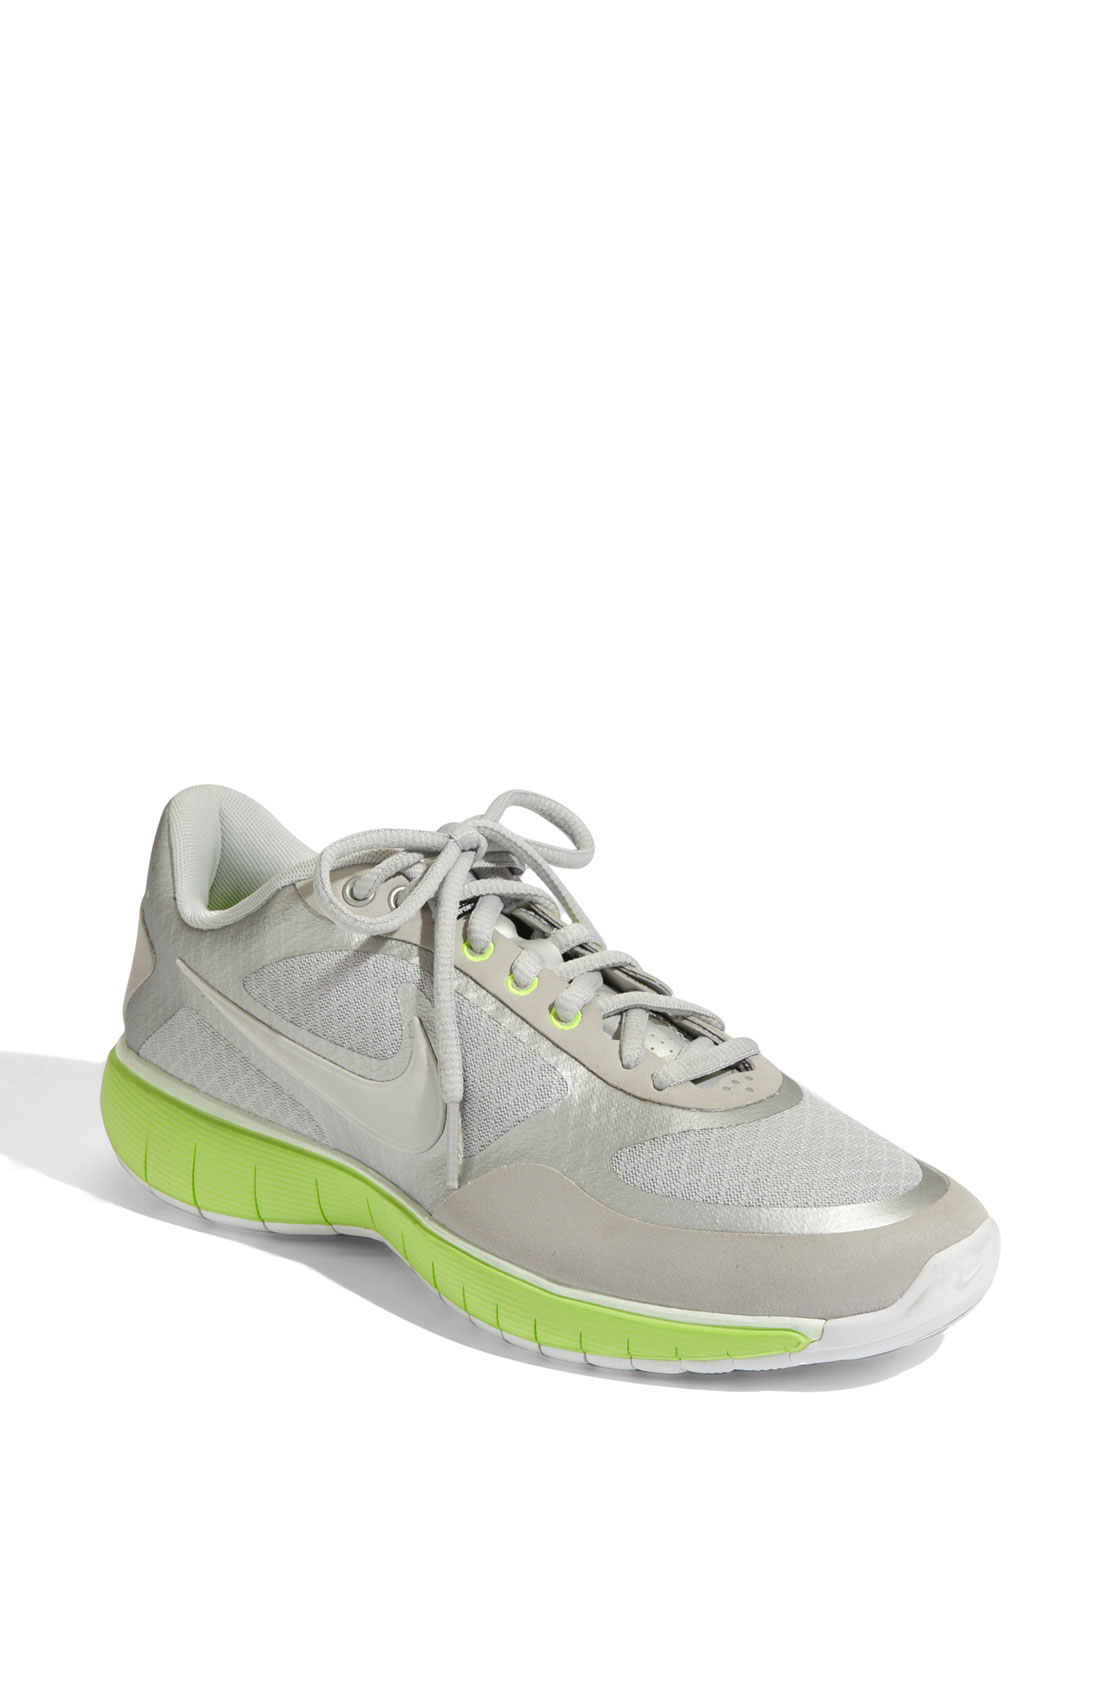 Nike Free 5.0 V3 Review